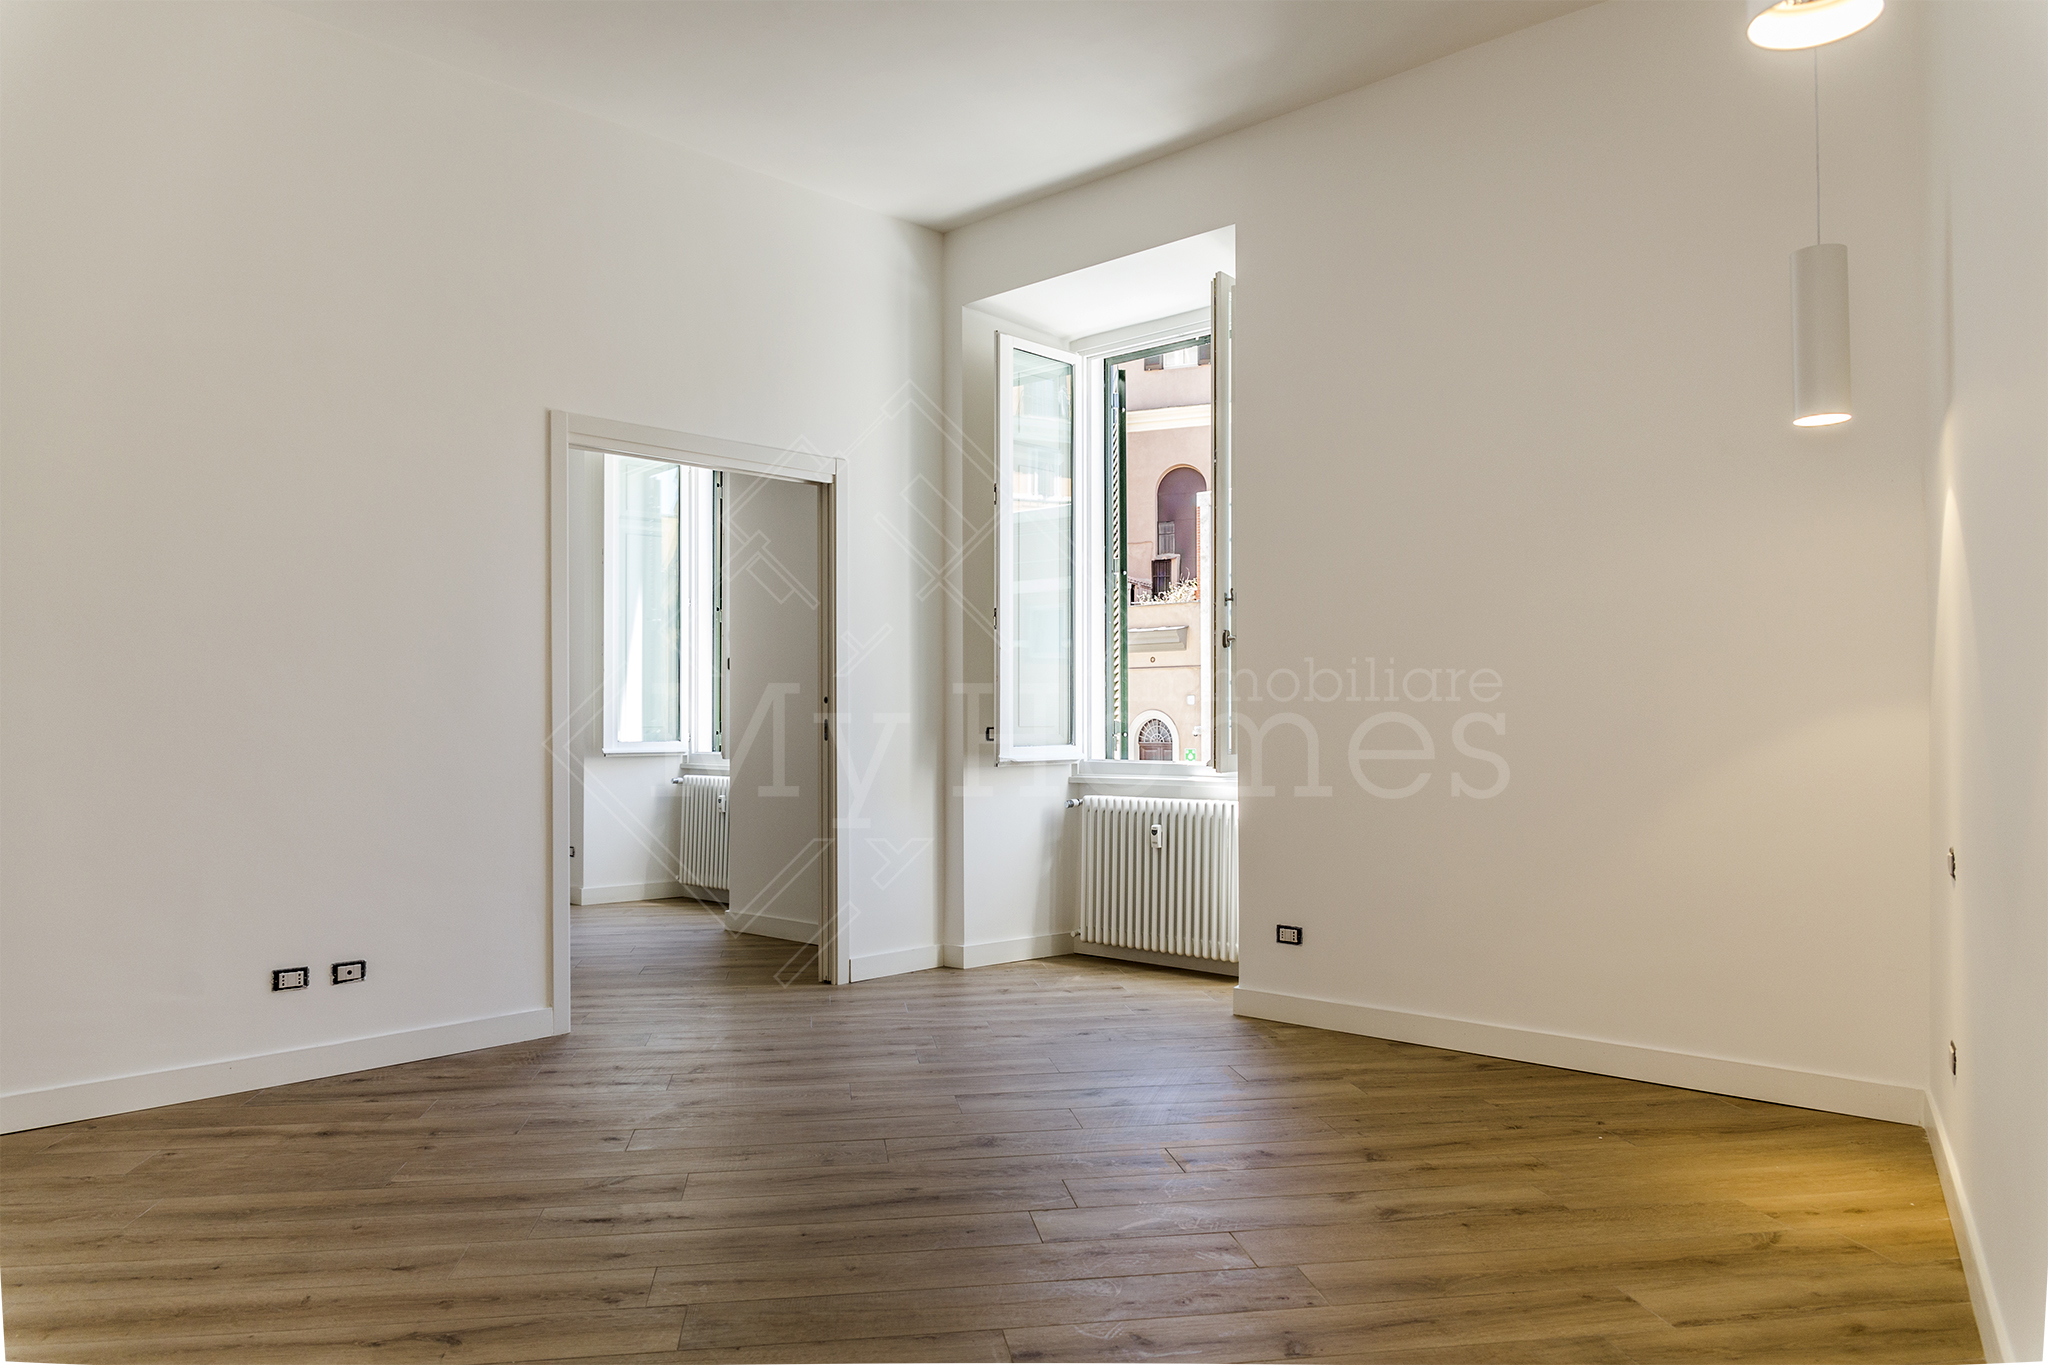 Appartamento Piazza Adriana, Prati